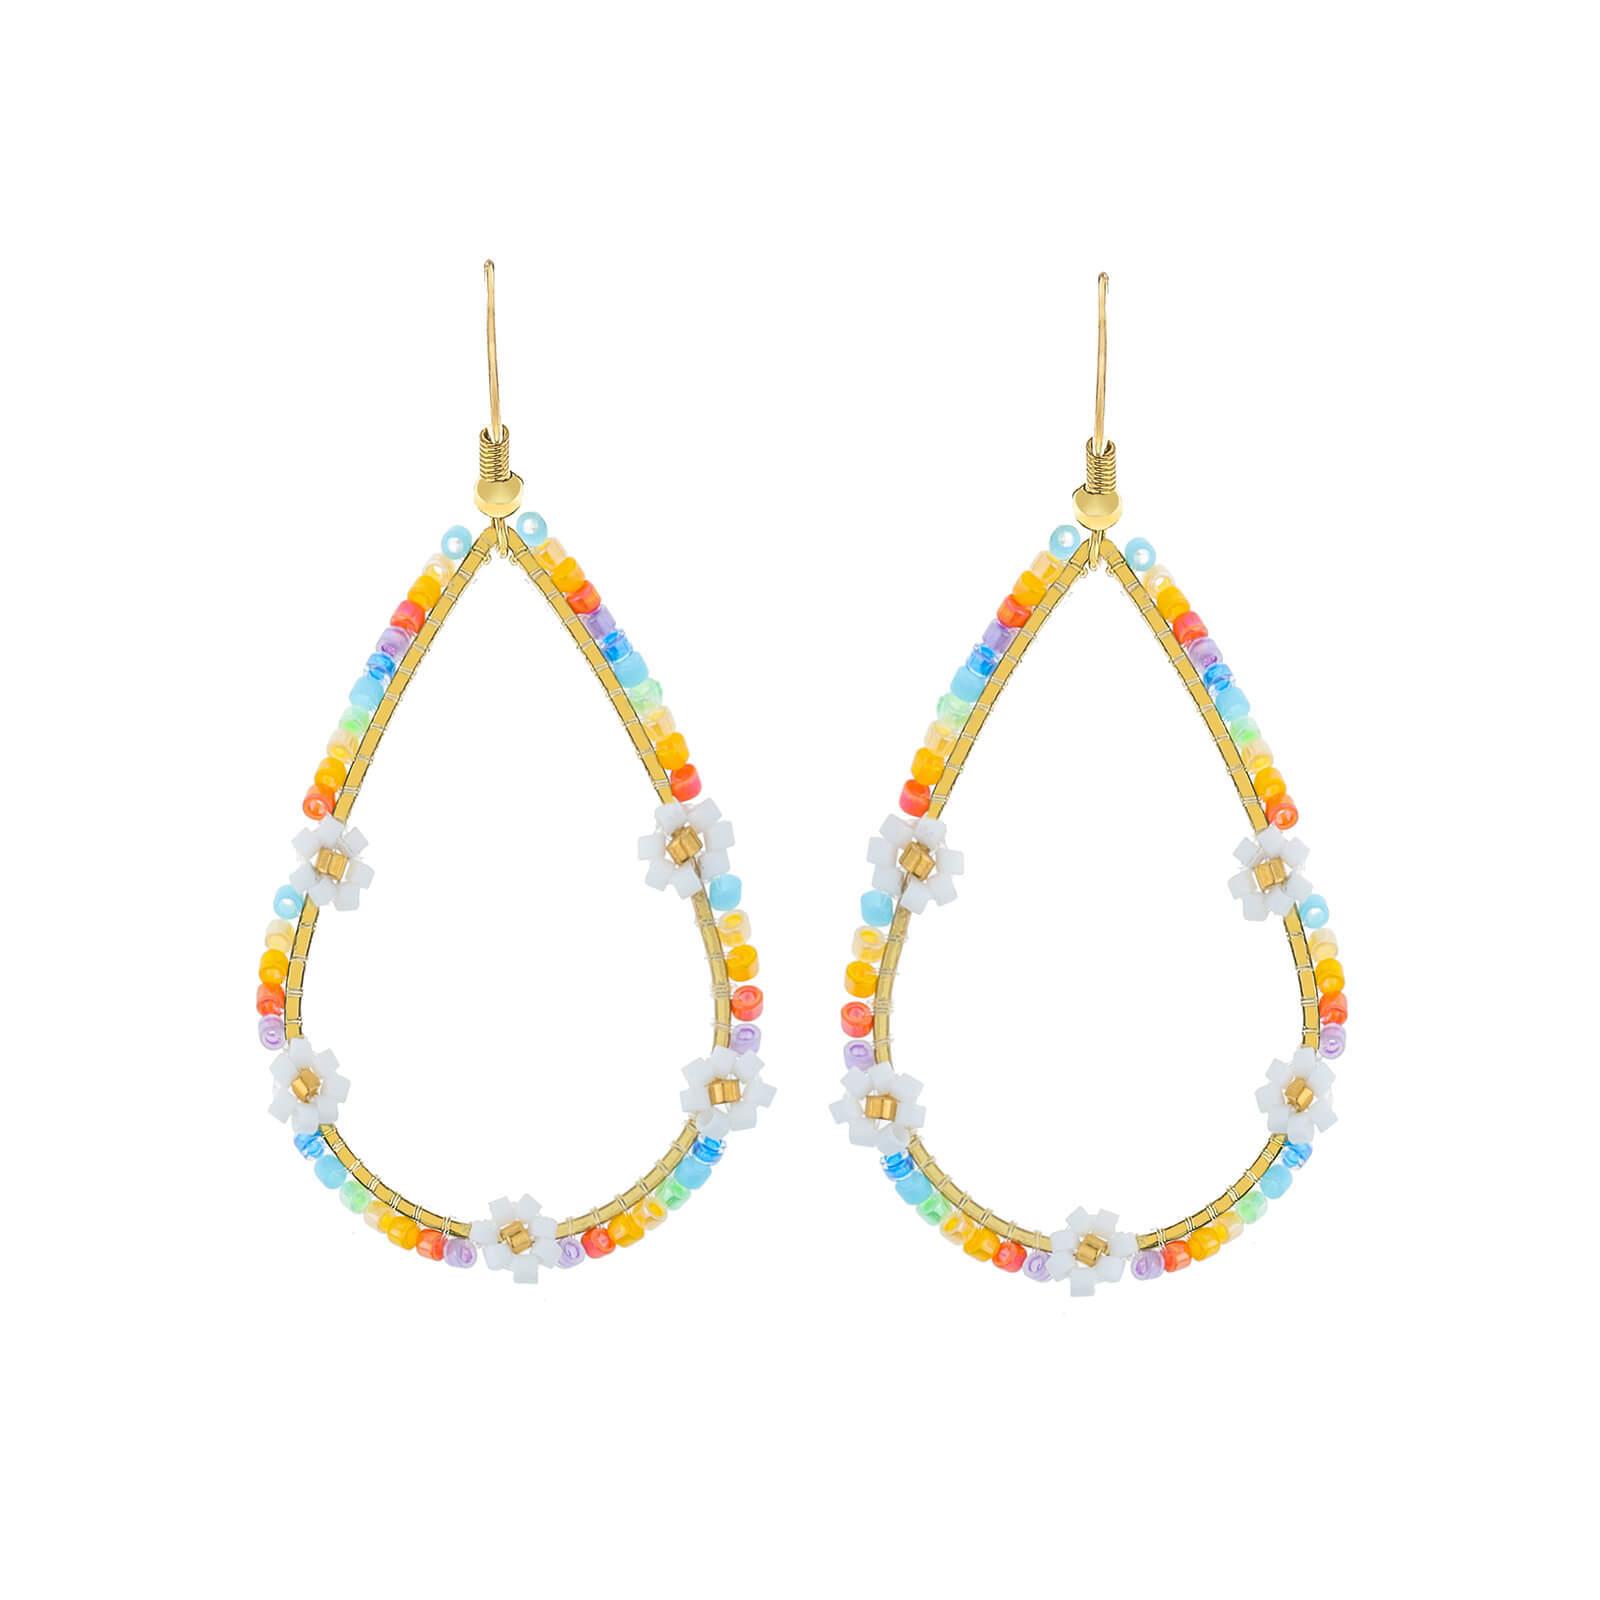 Daisy Miyuki bead earring